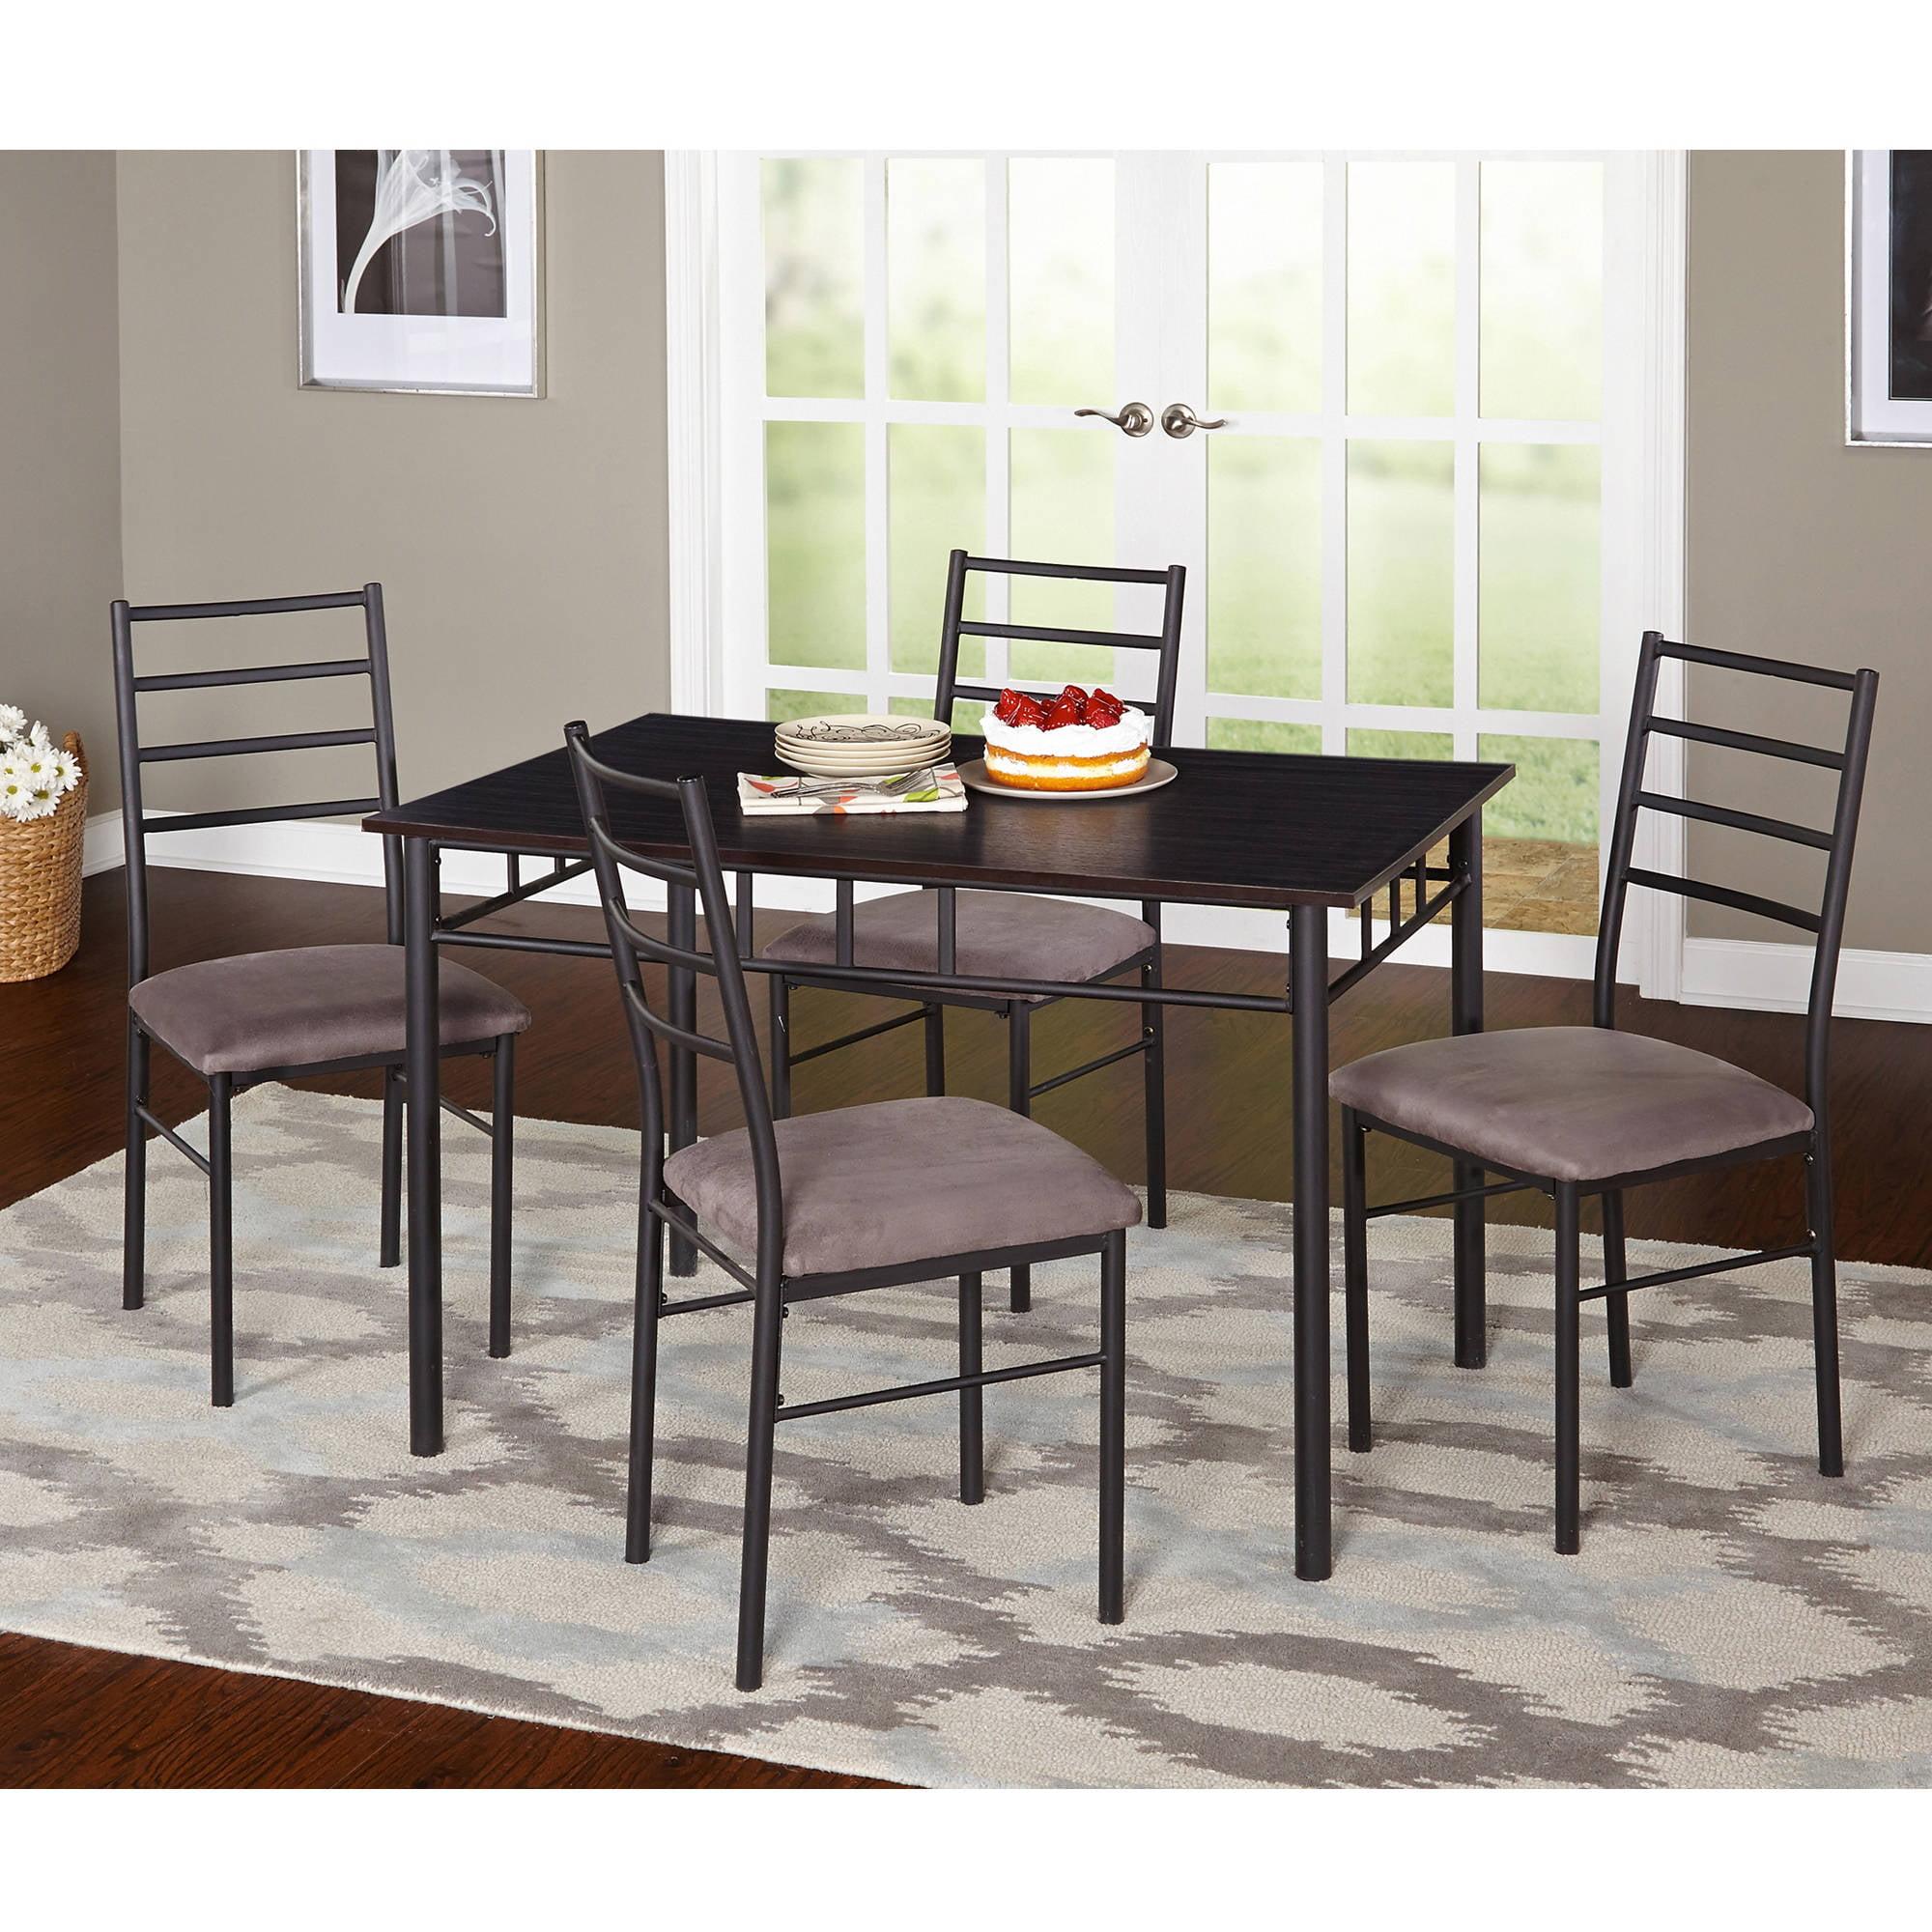 Liv 5-Piece Liv Dining Room Set, Black Gray by Target Marketing Systems Inc